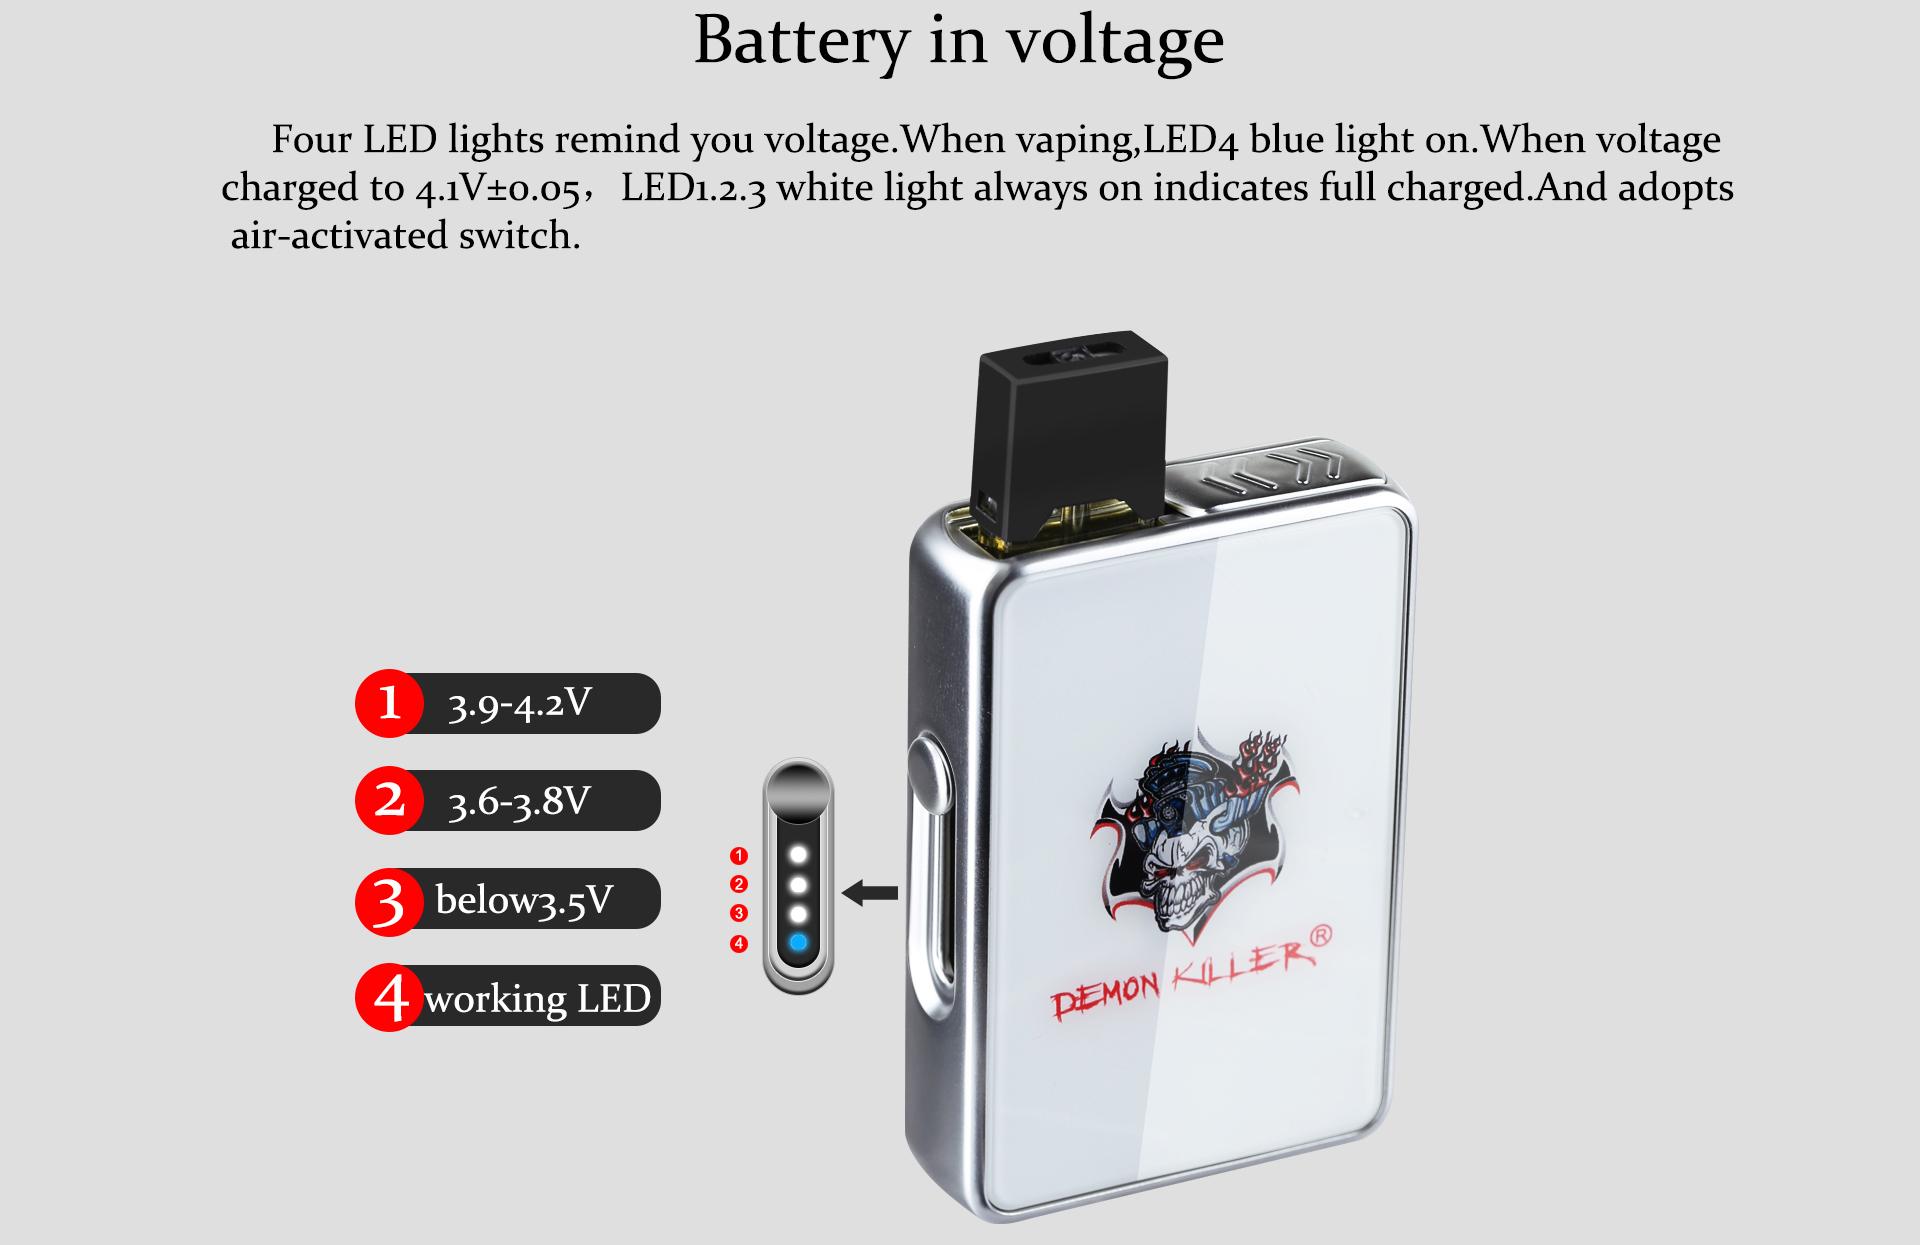 Demon Killer JBOX Mod Voltage